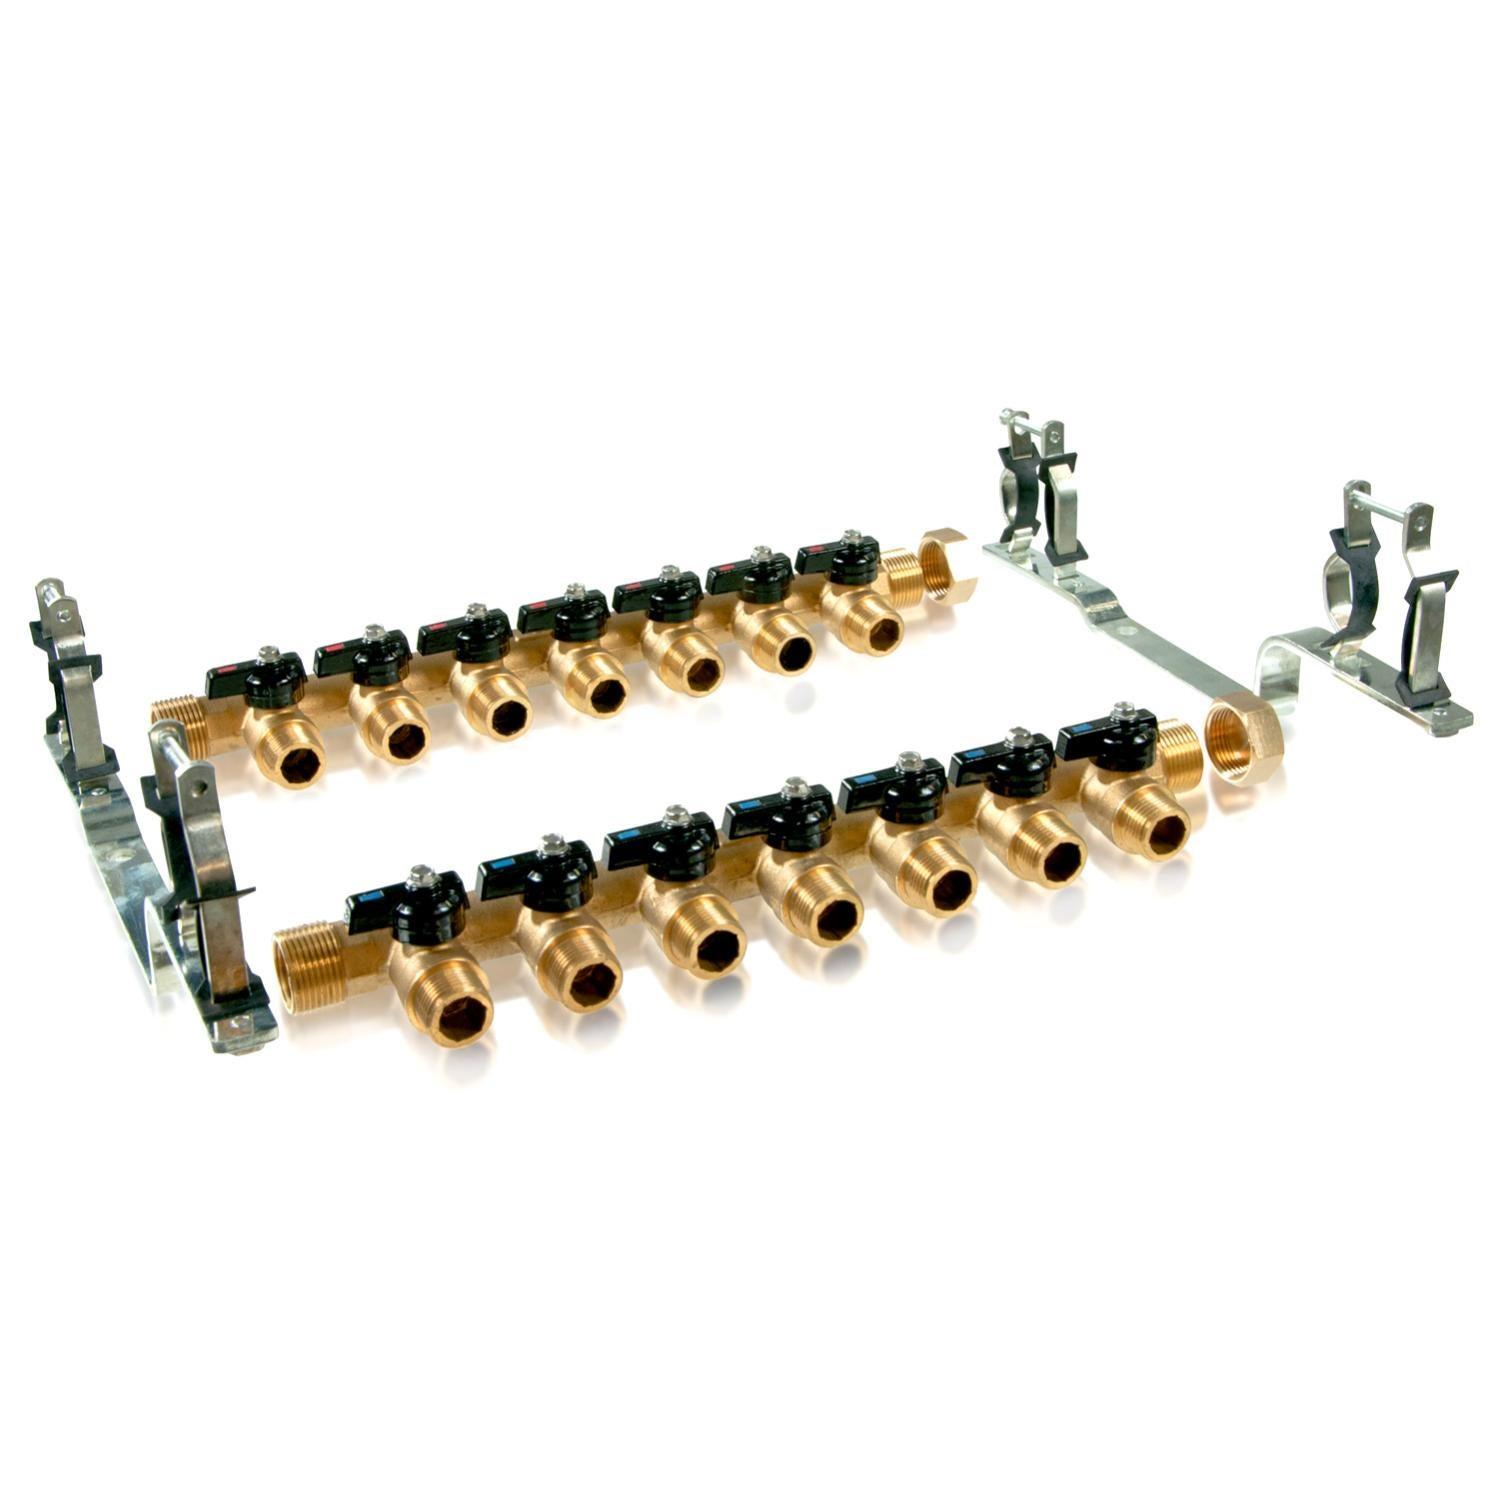 Kit collecteur radiateur Kit collecteur radiateur ARCANAUTE 7 Circuits